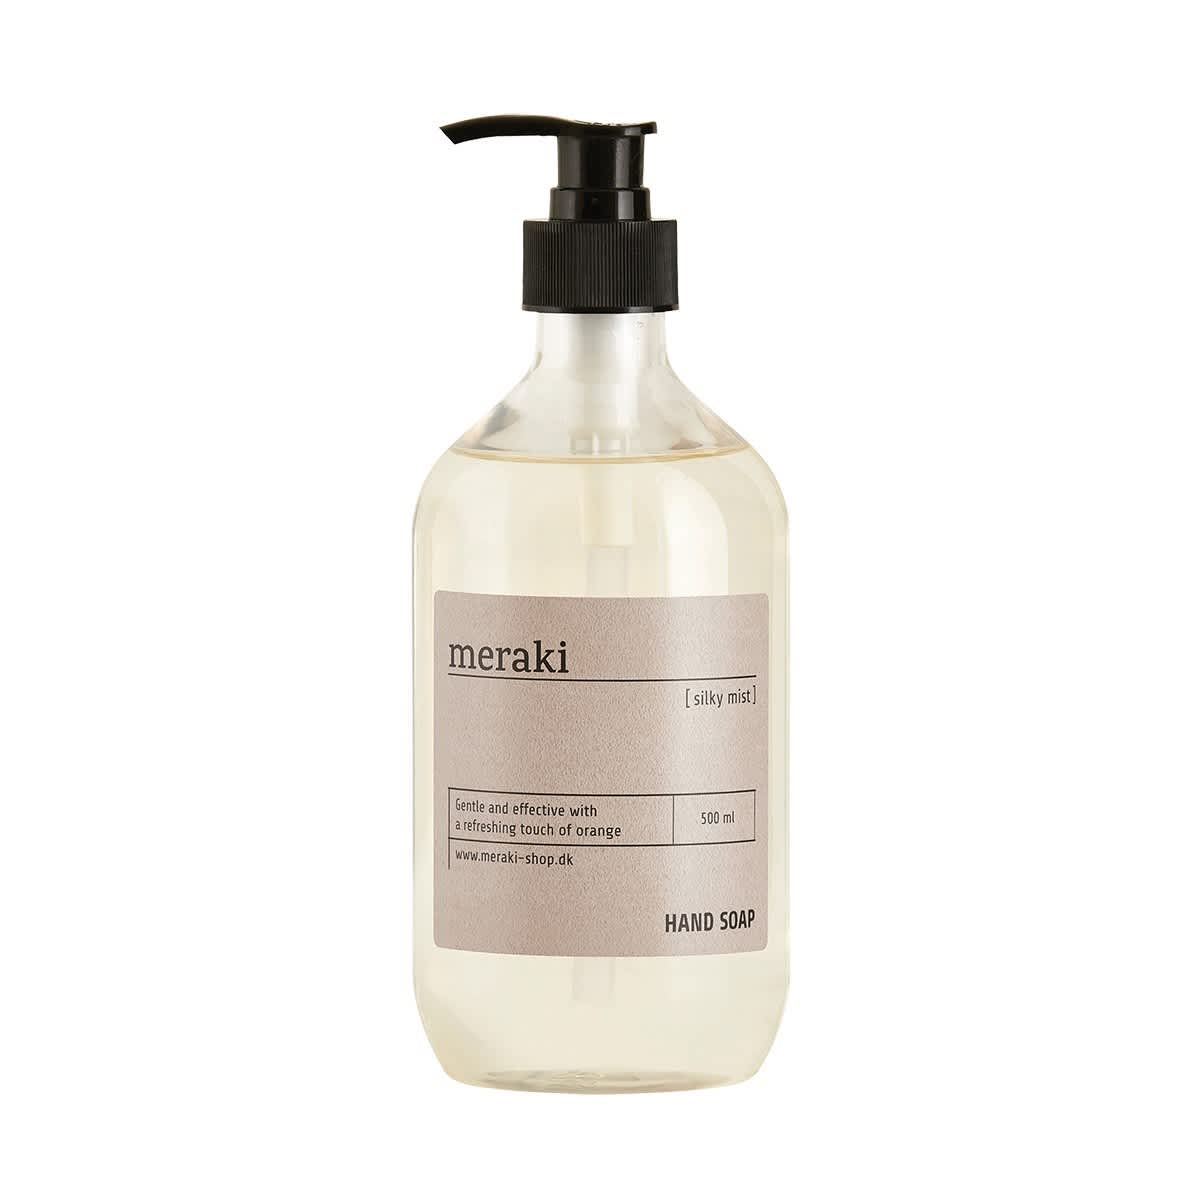 Meraki Silky Mist Liquid soap